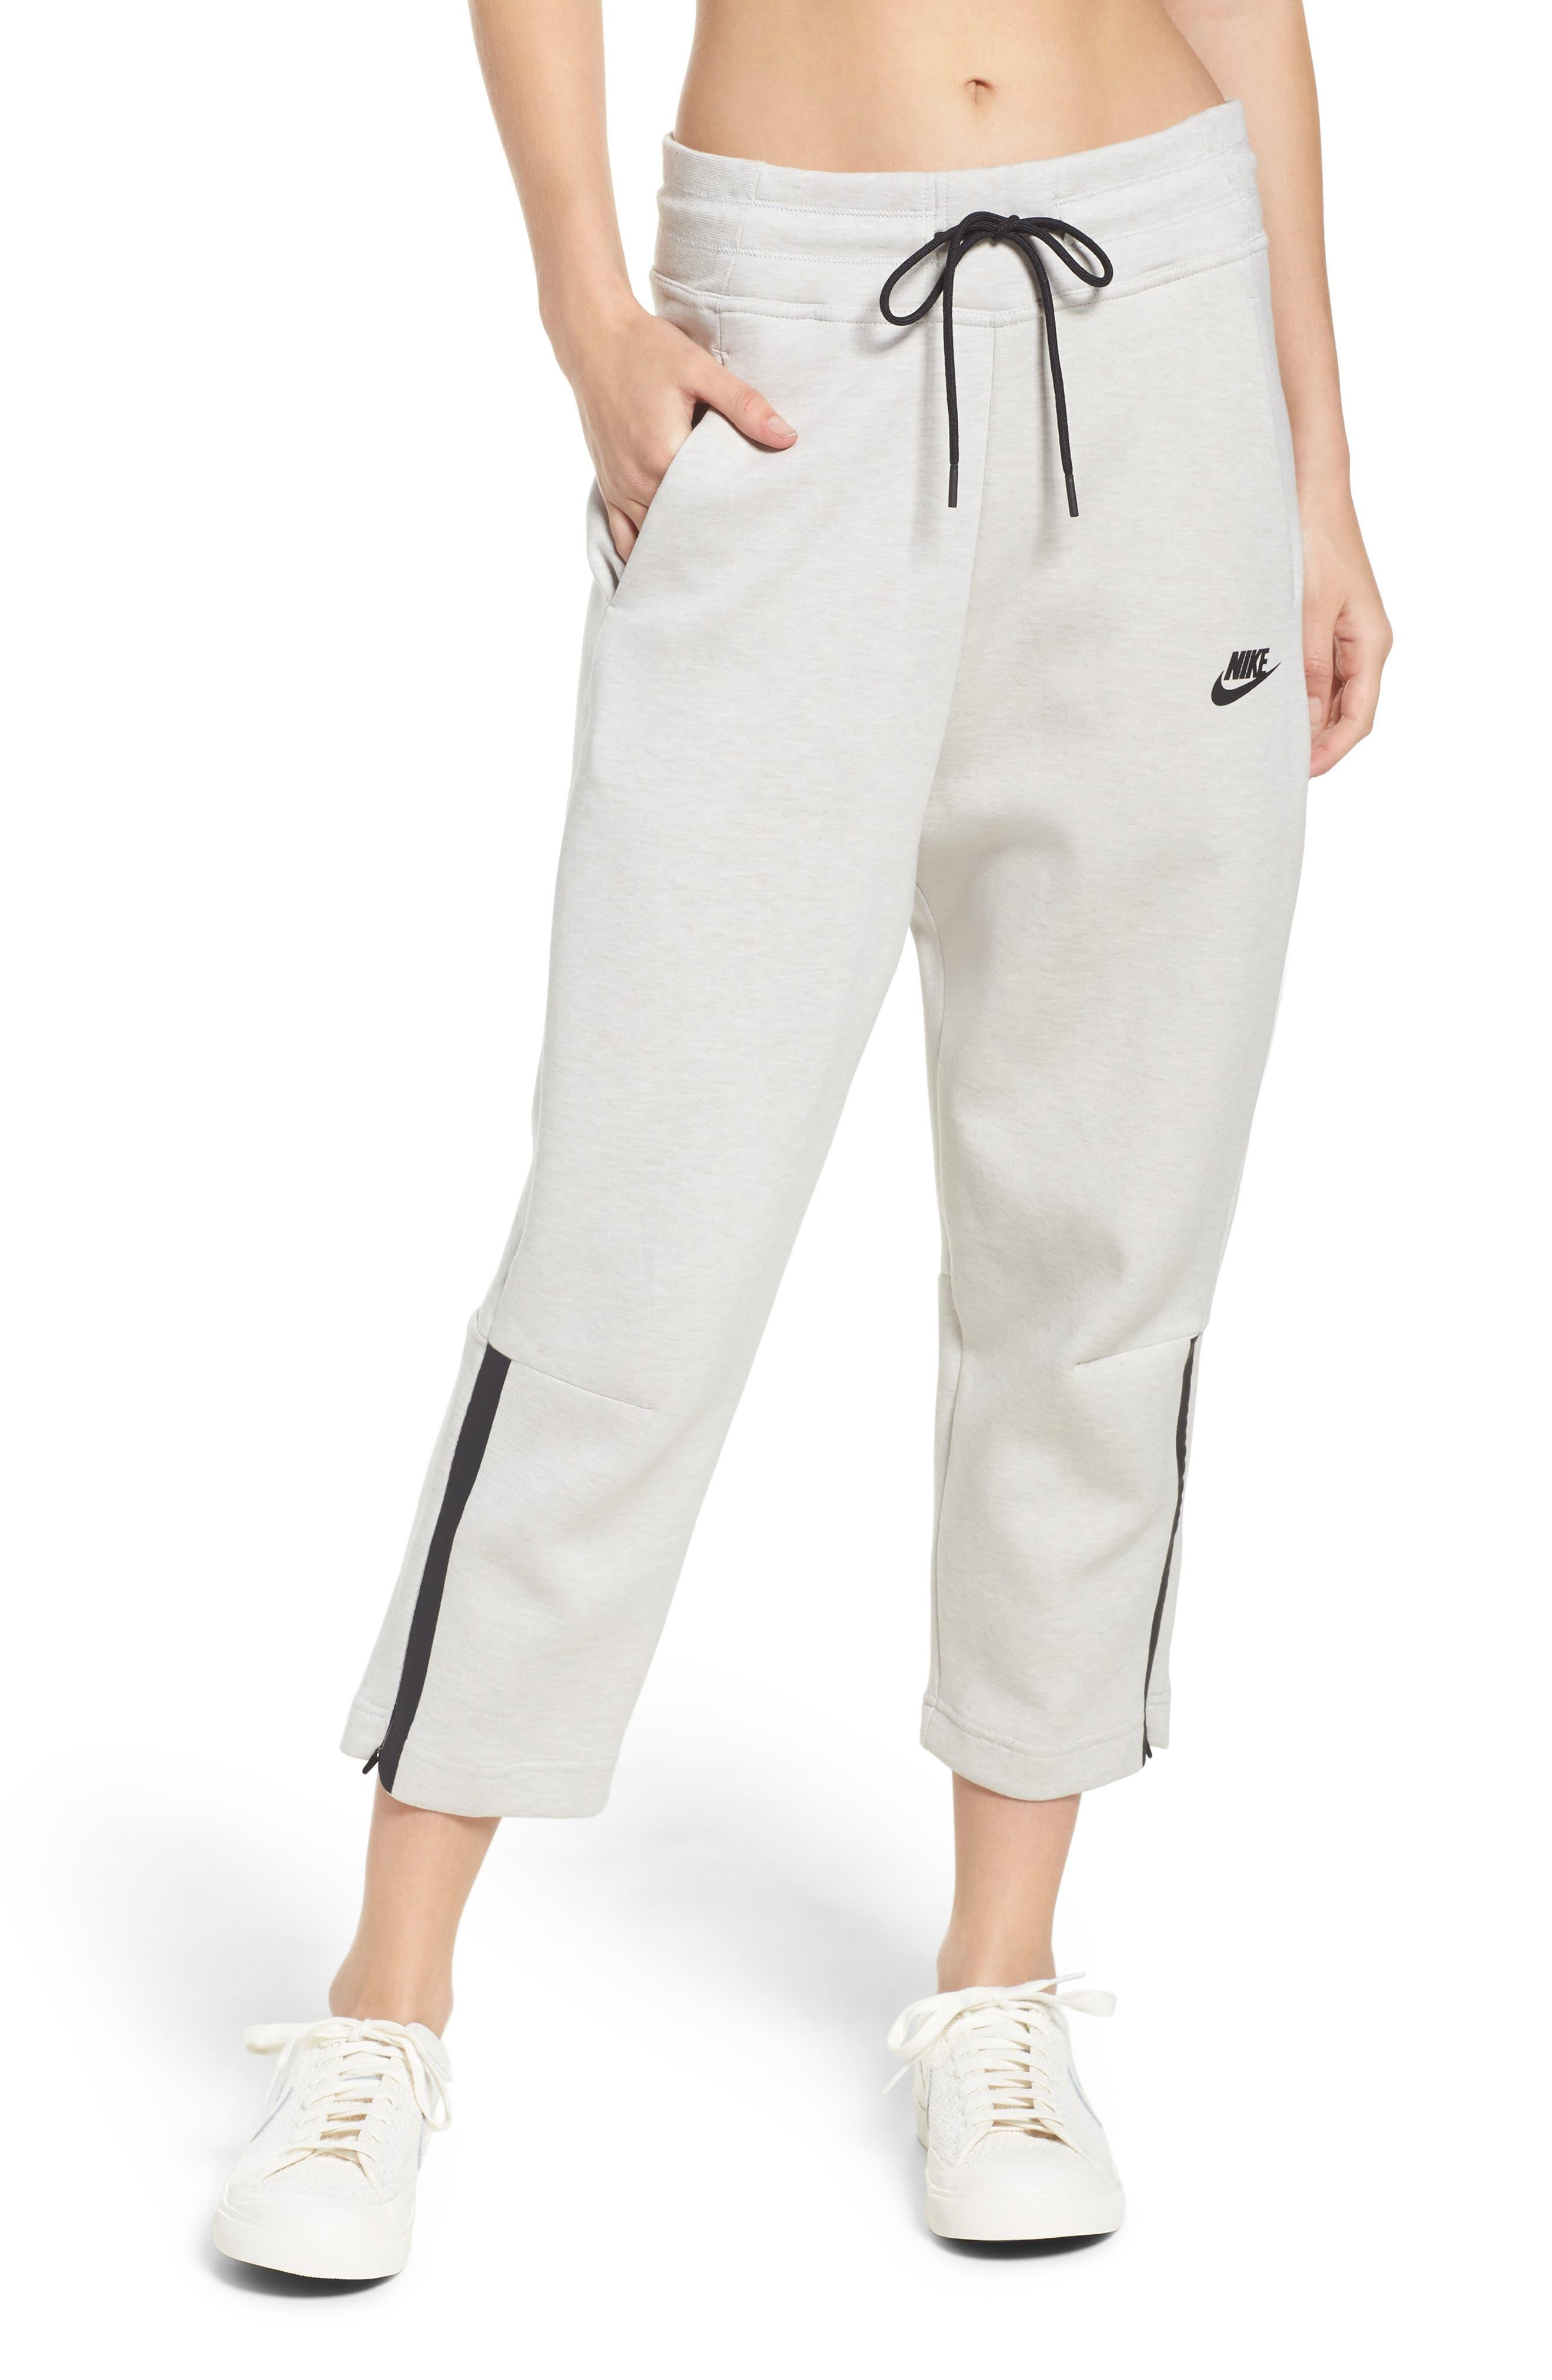 Nike Capri Sweatpants